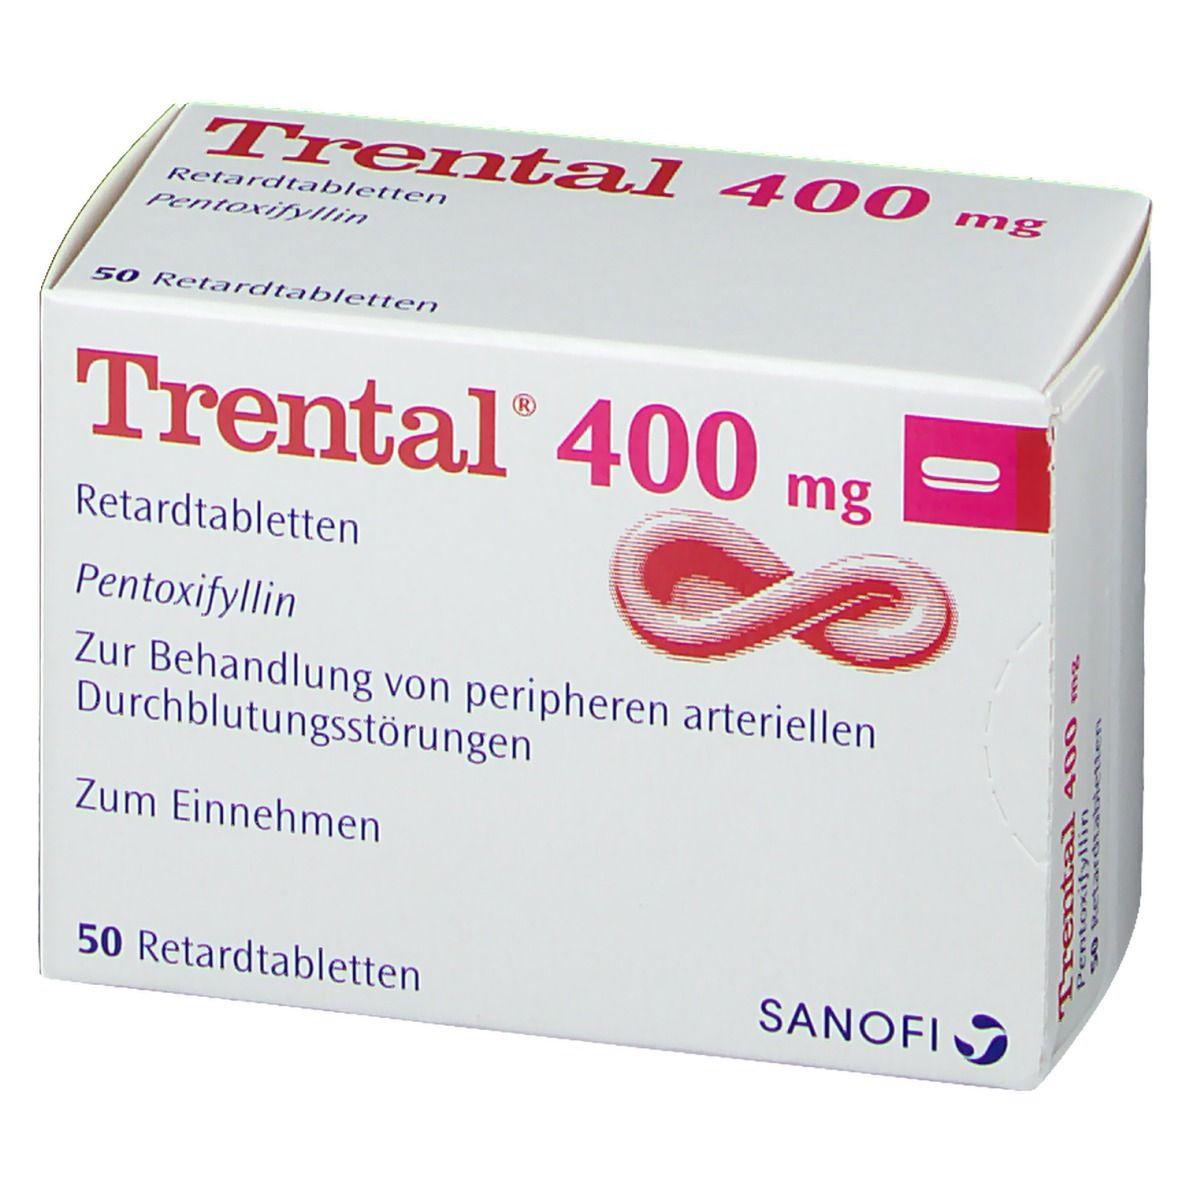 Trental 400 Retardtabletten 50 St - shop-apotheke.com